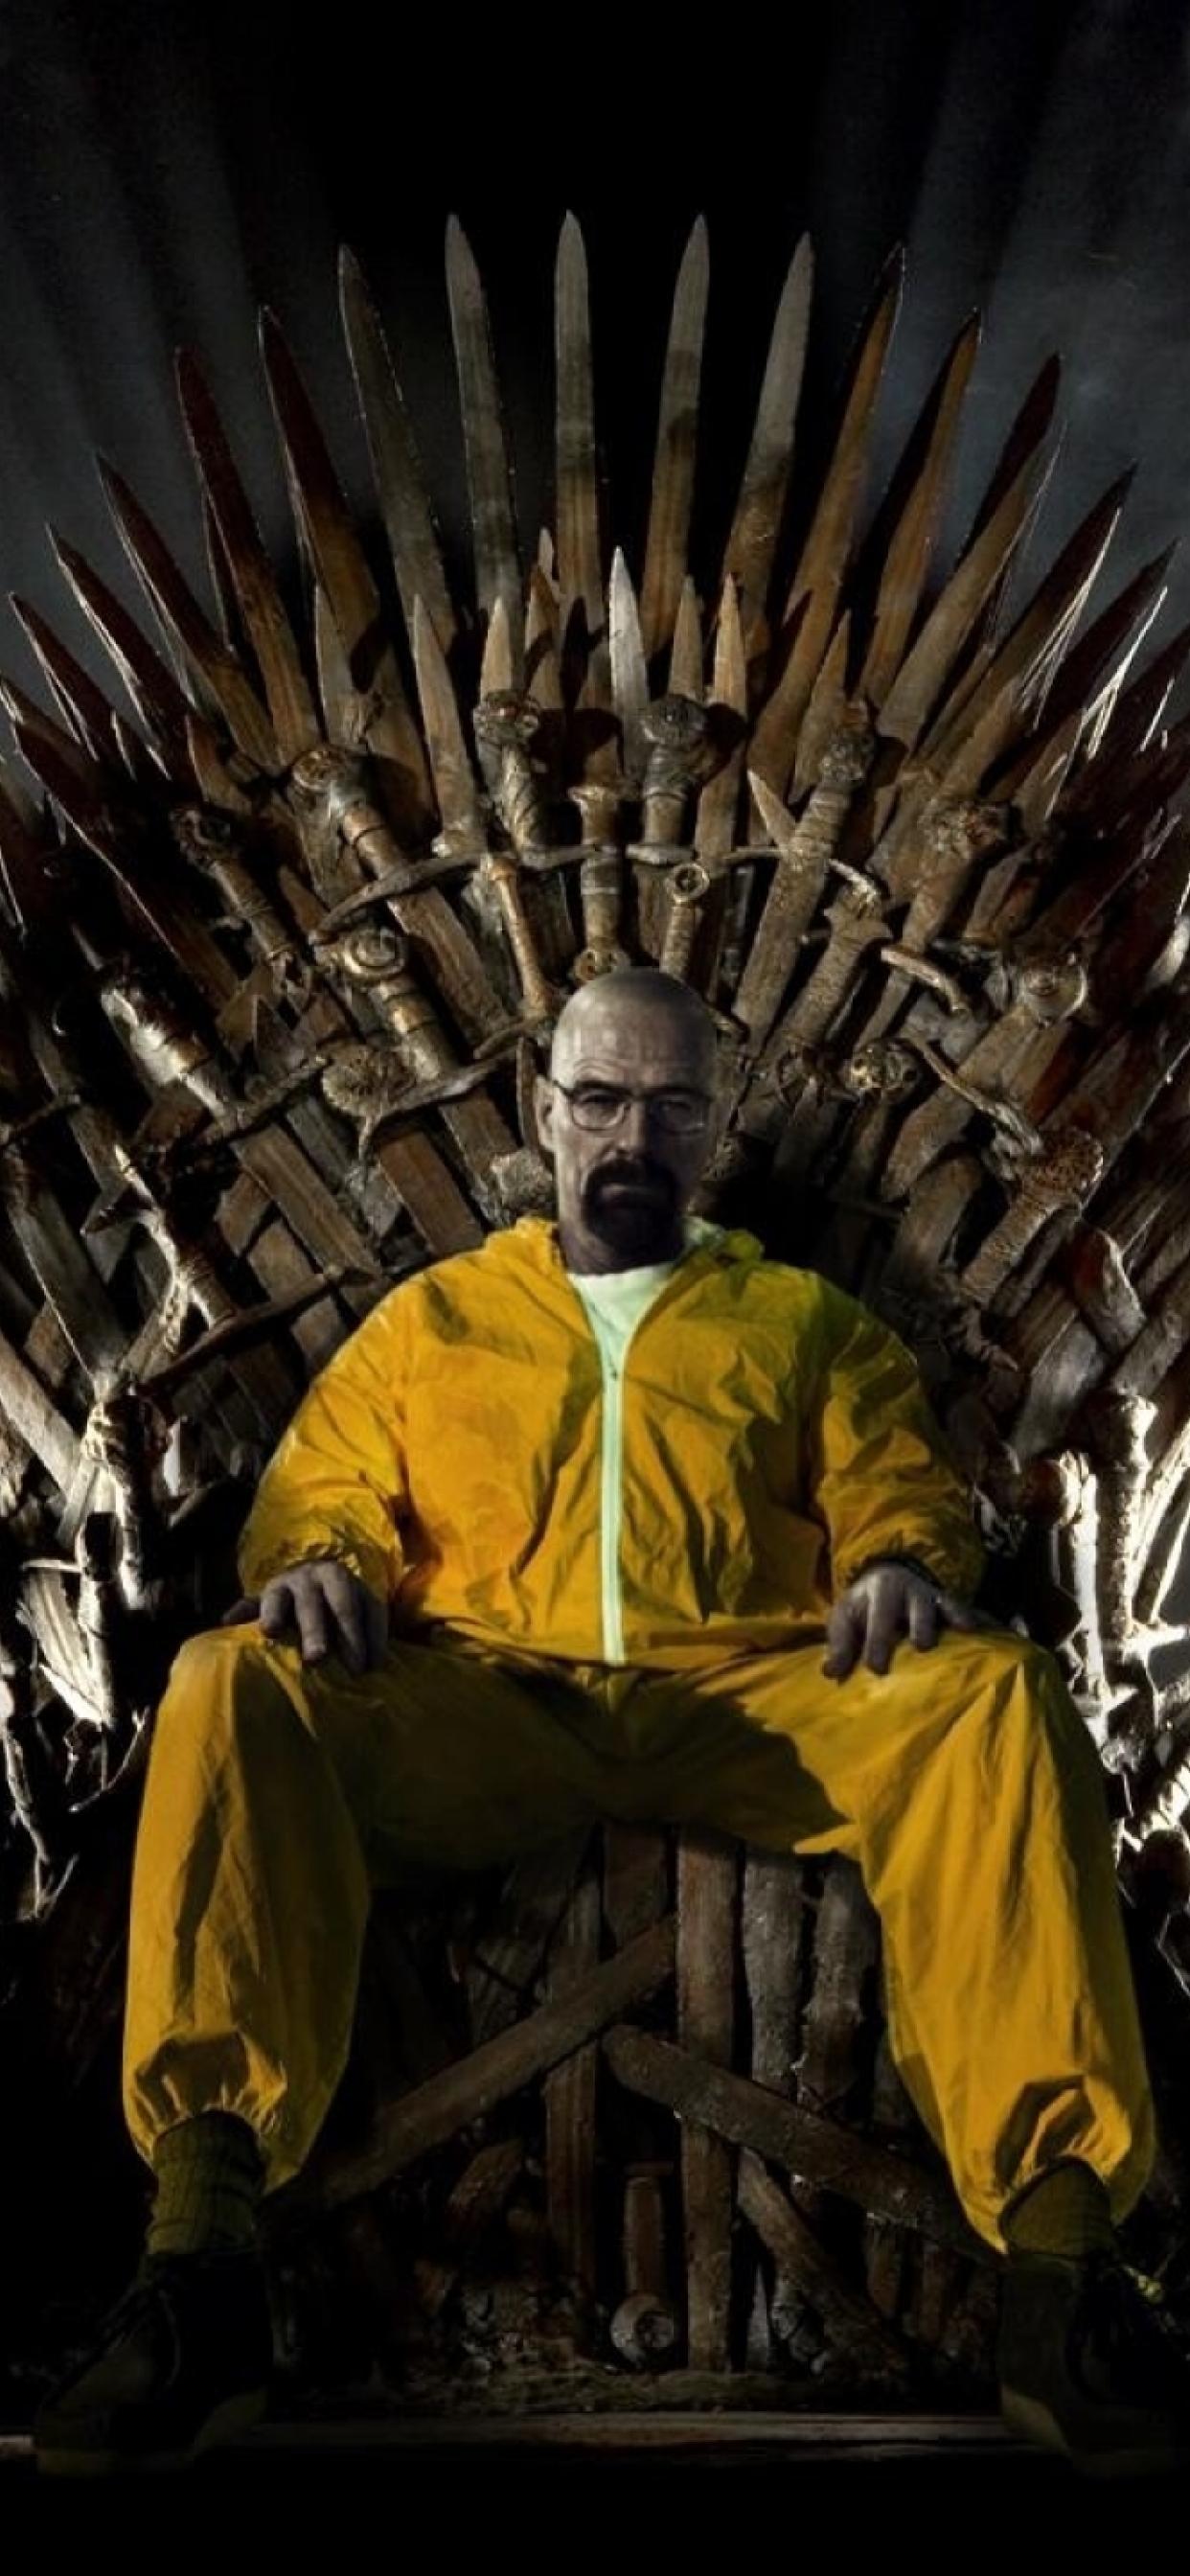 1242x2688 Breaking Bad Game Of Thrones Wallpapers Iphone ...